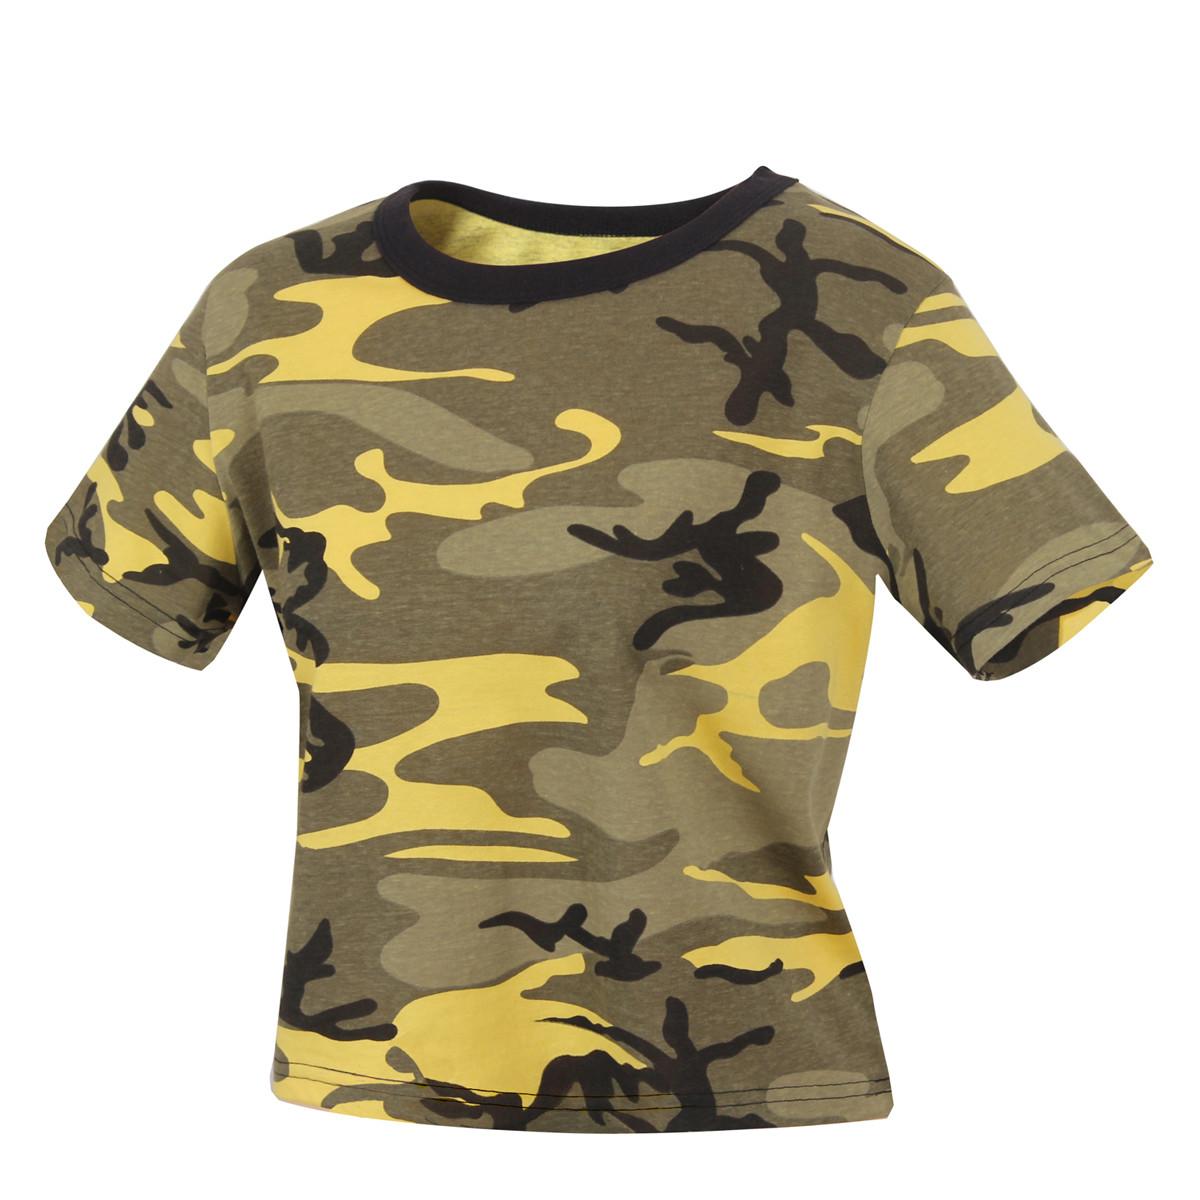 34a02953a2ec3c Shop Womens Crop Stinger Yellow Camo T s - Fatigues Army Navy Gear